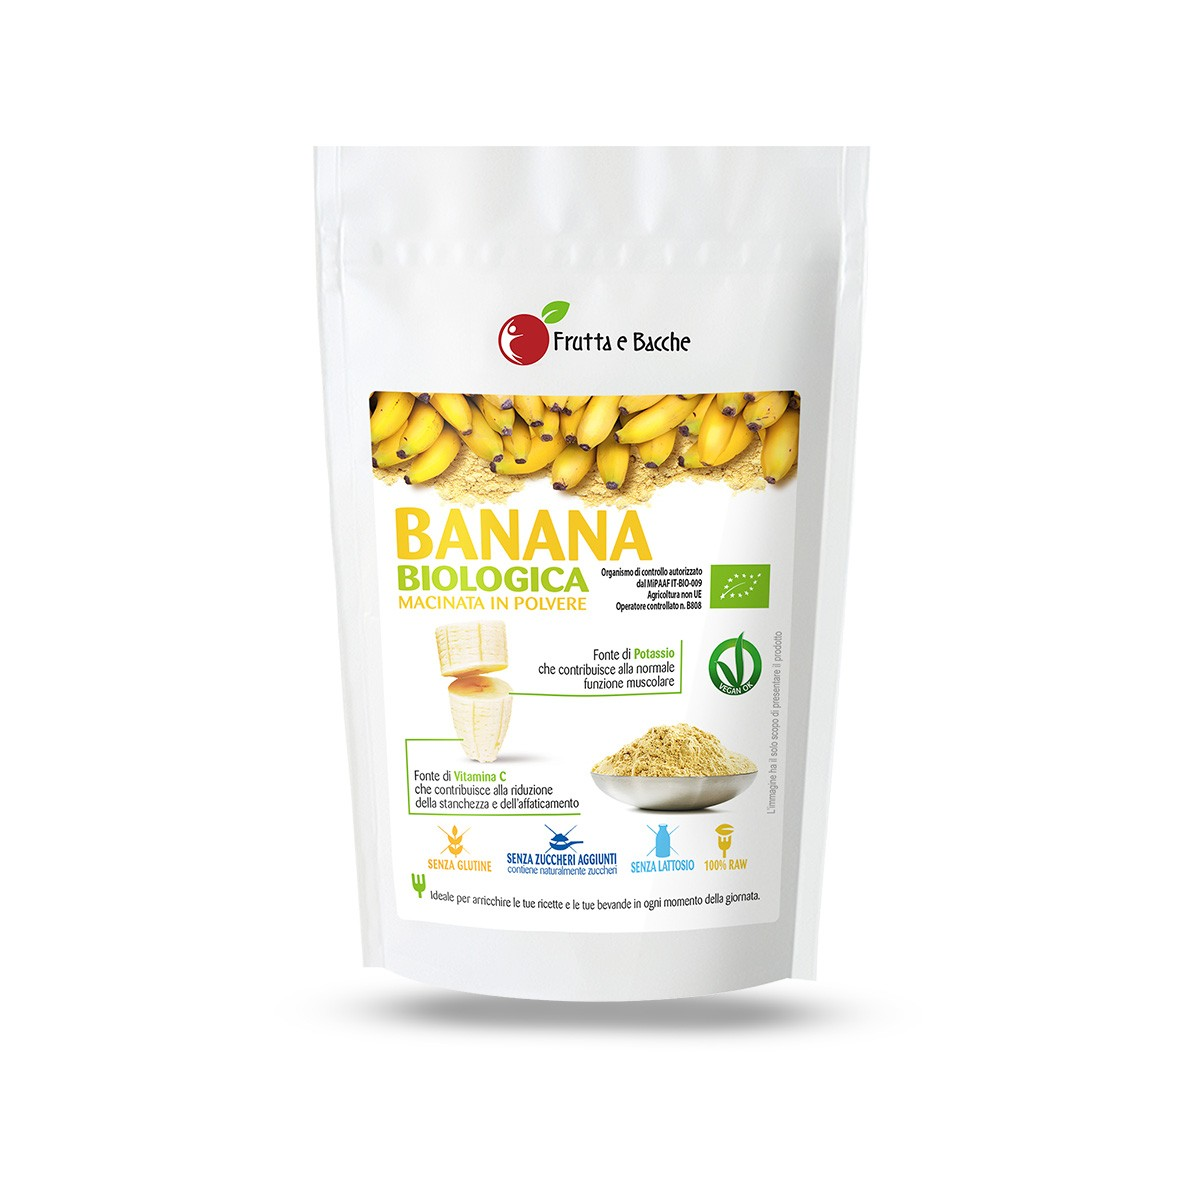 Polvere di banana biologica macinata vendita online for Frutta online